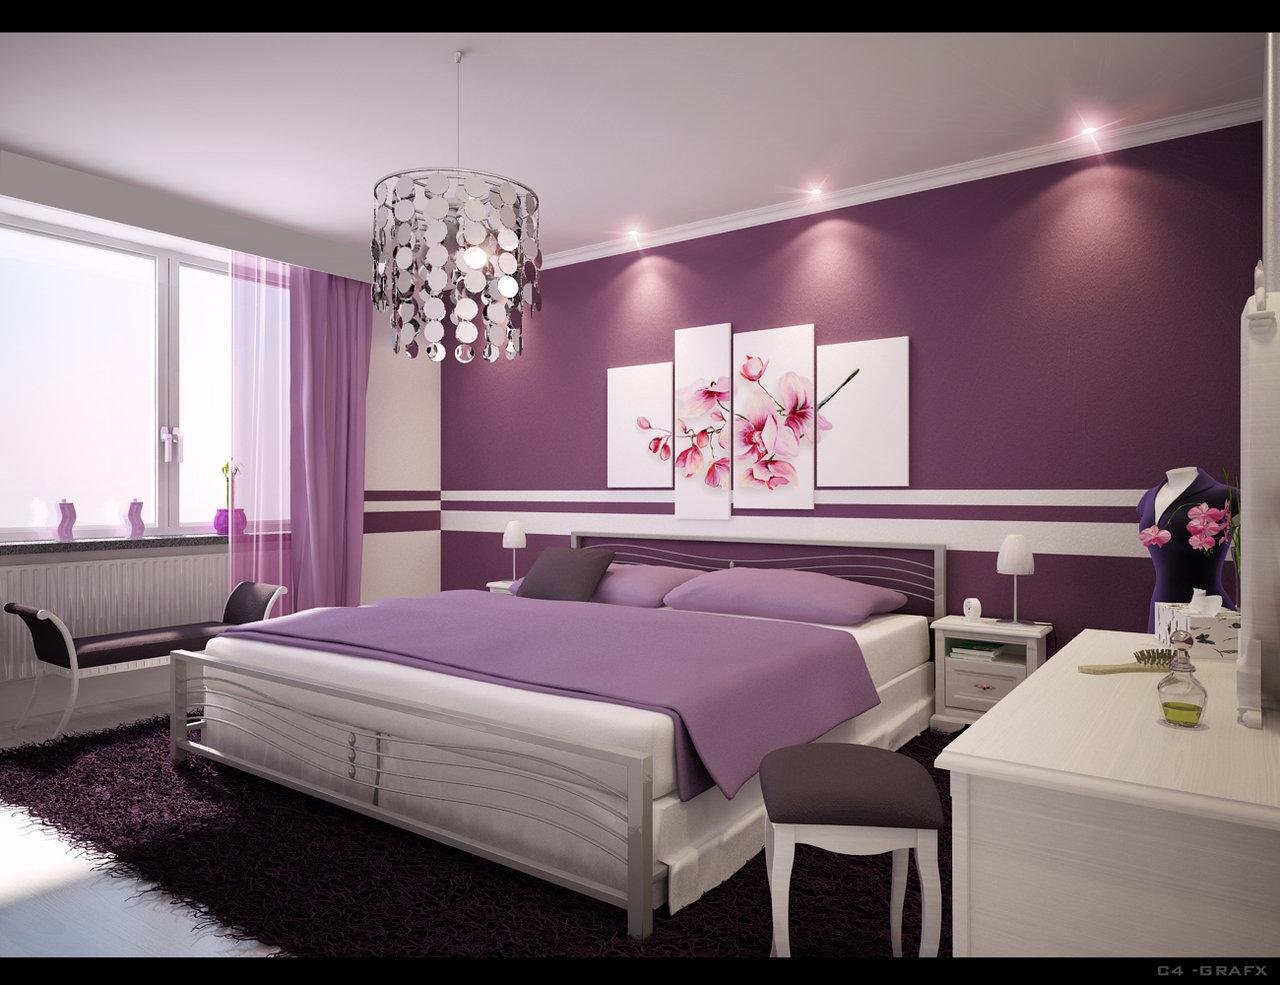 بالصور احلى غرف نوم , احدث غرف نوم مودرن 2597 10